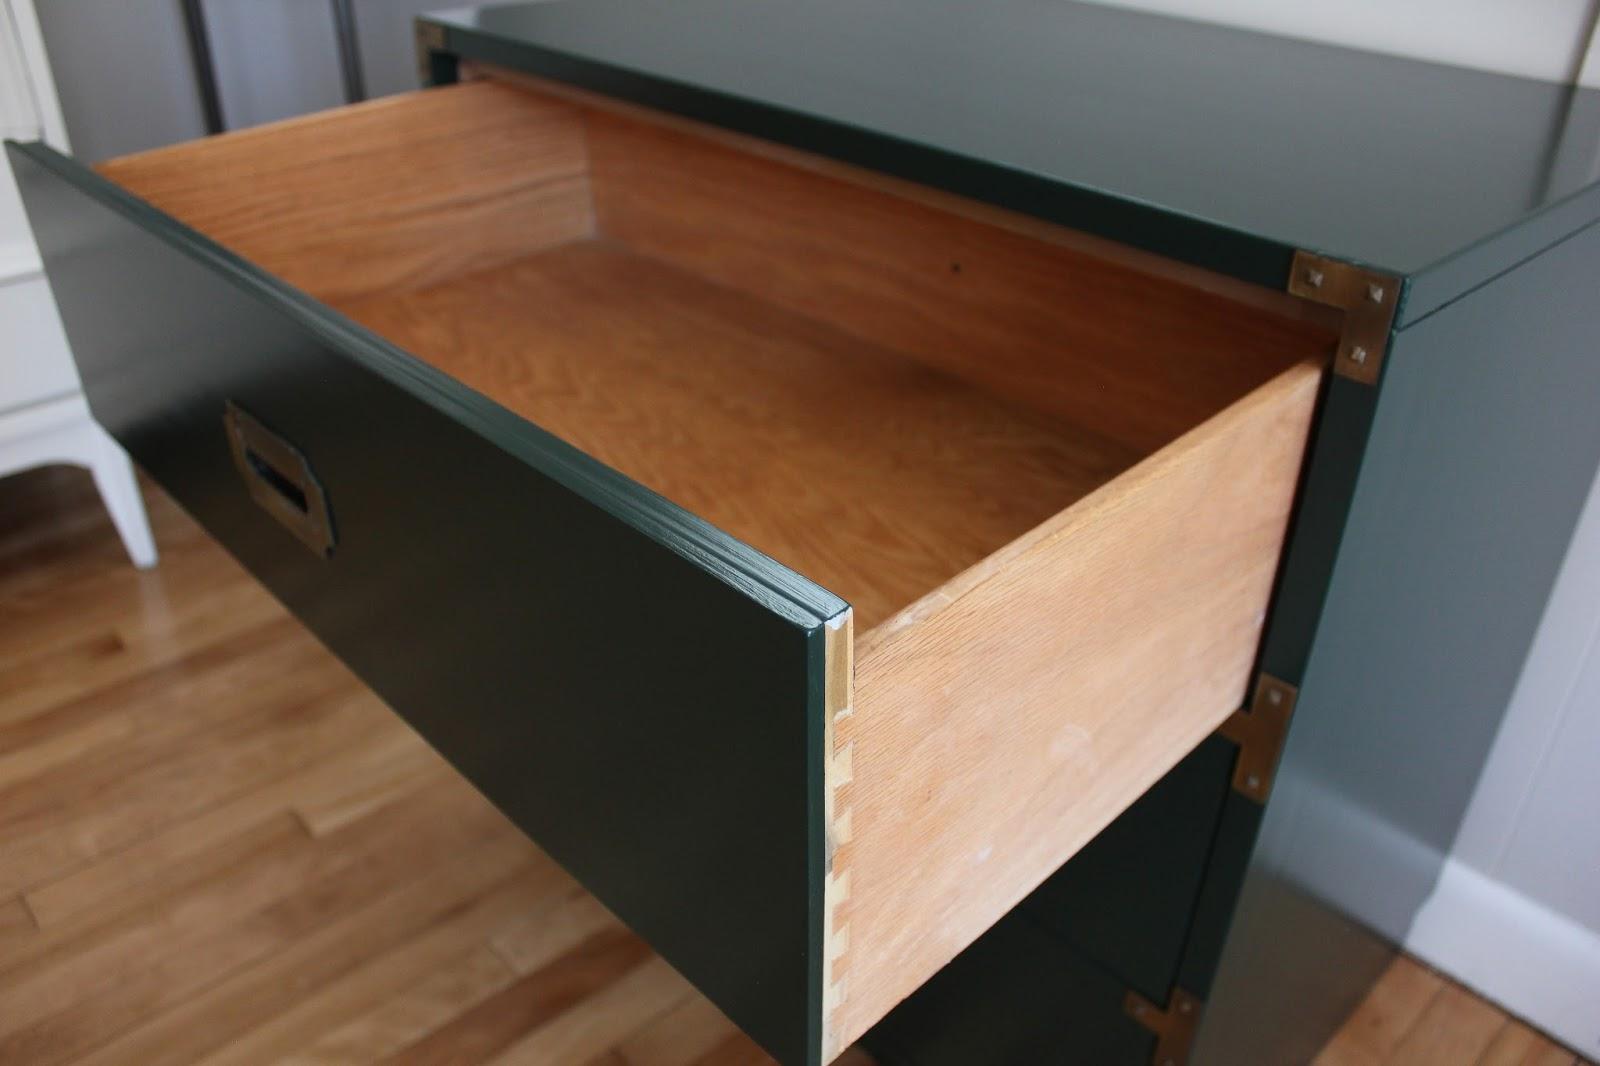 blue lamb furnishings : 3-Drawer Drexel Campaign Dresser - SOLD